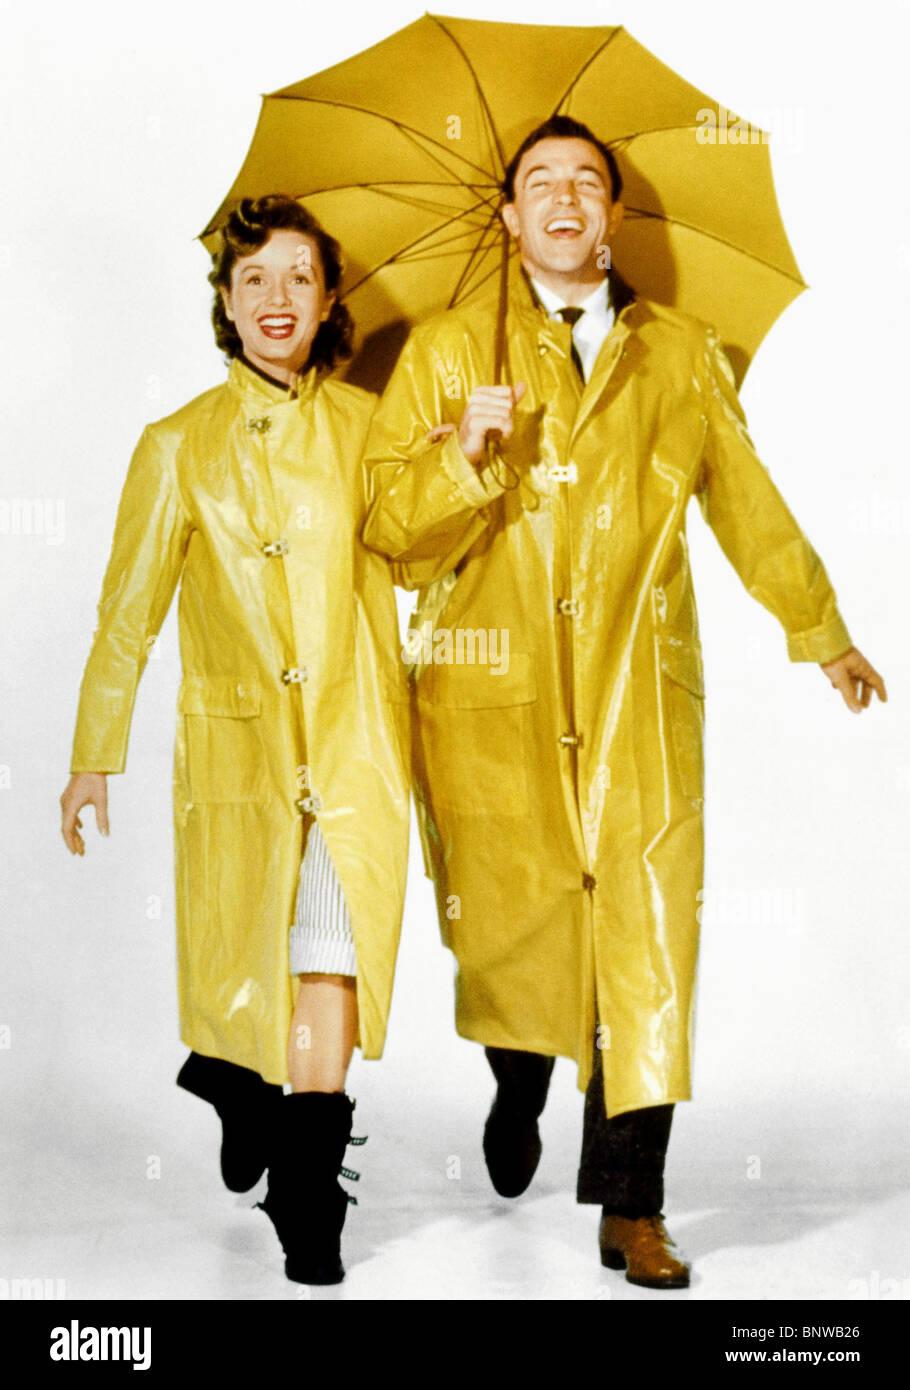 Buy Yellow Umbrella